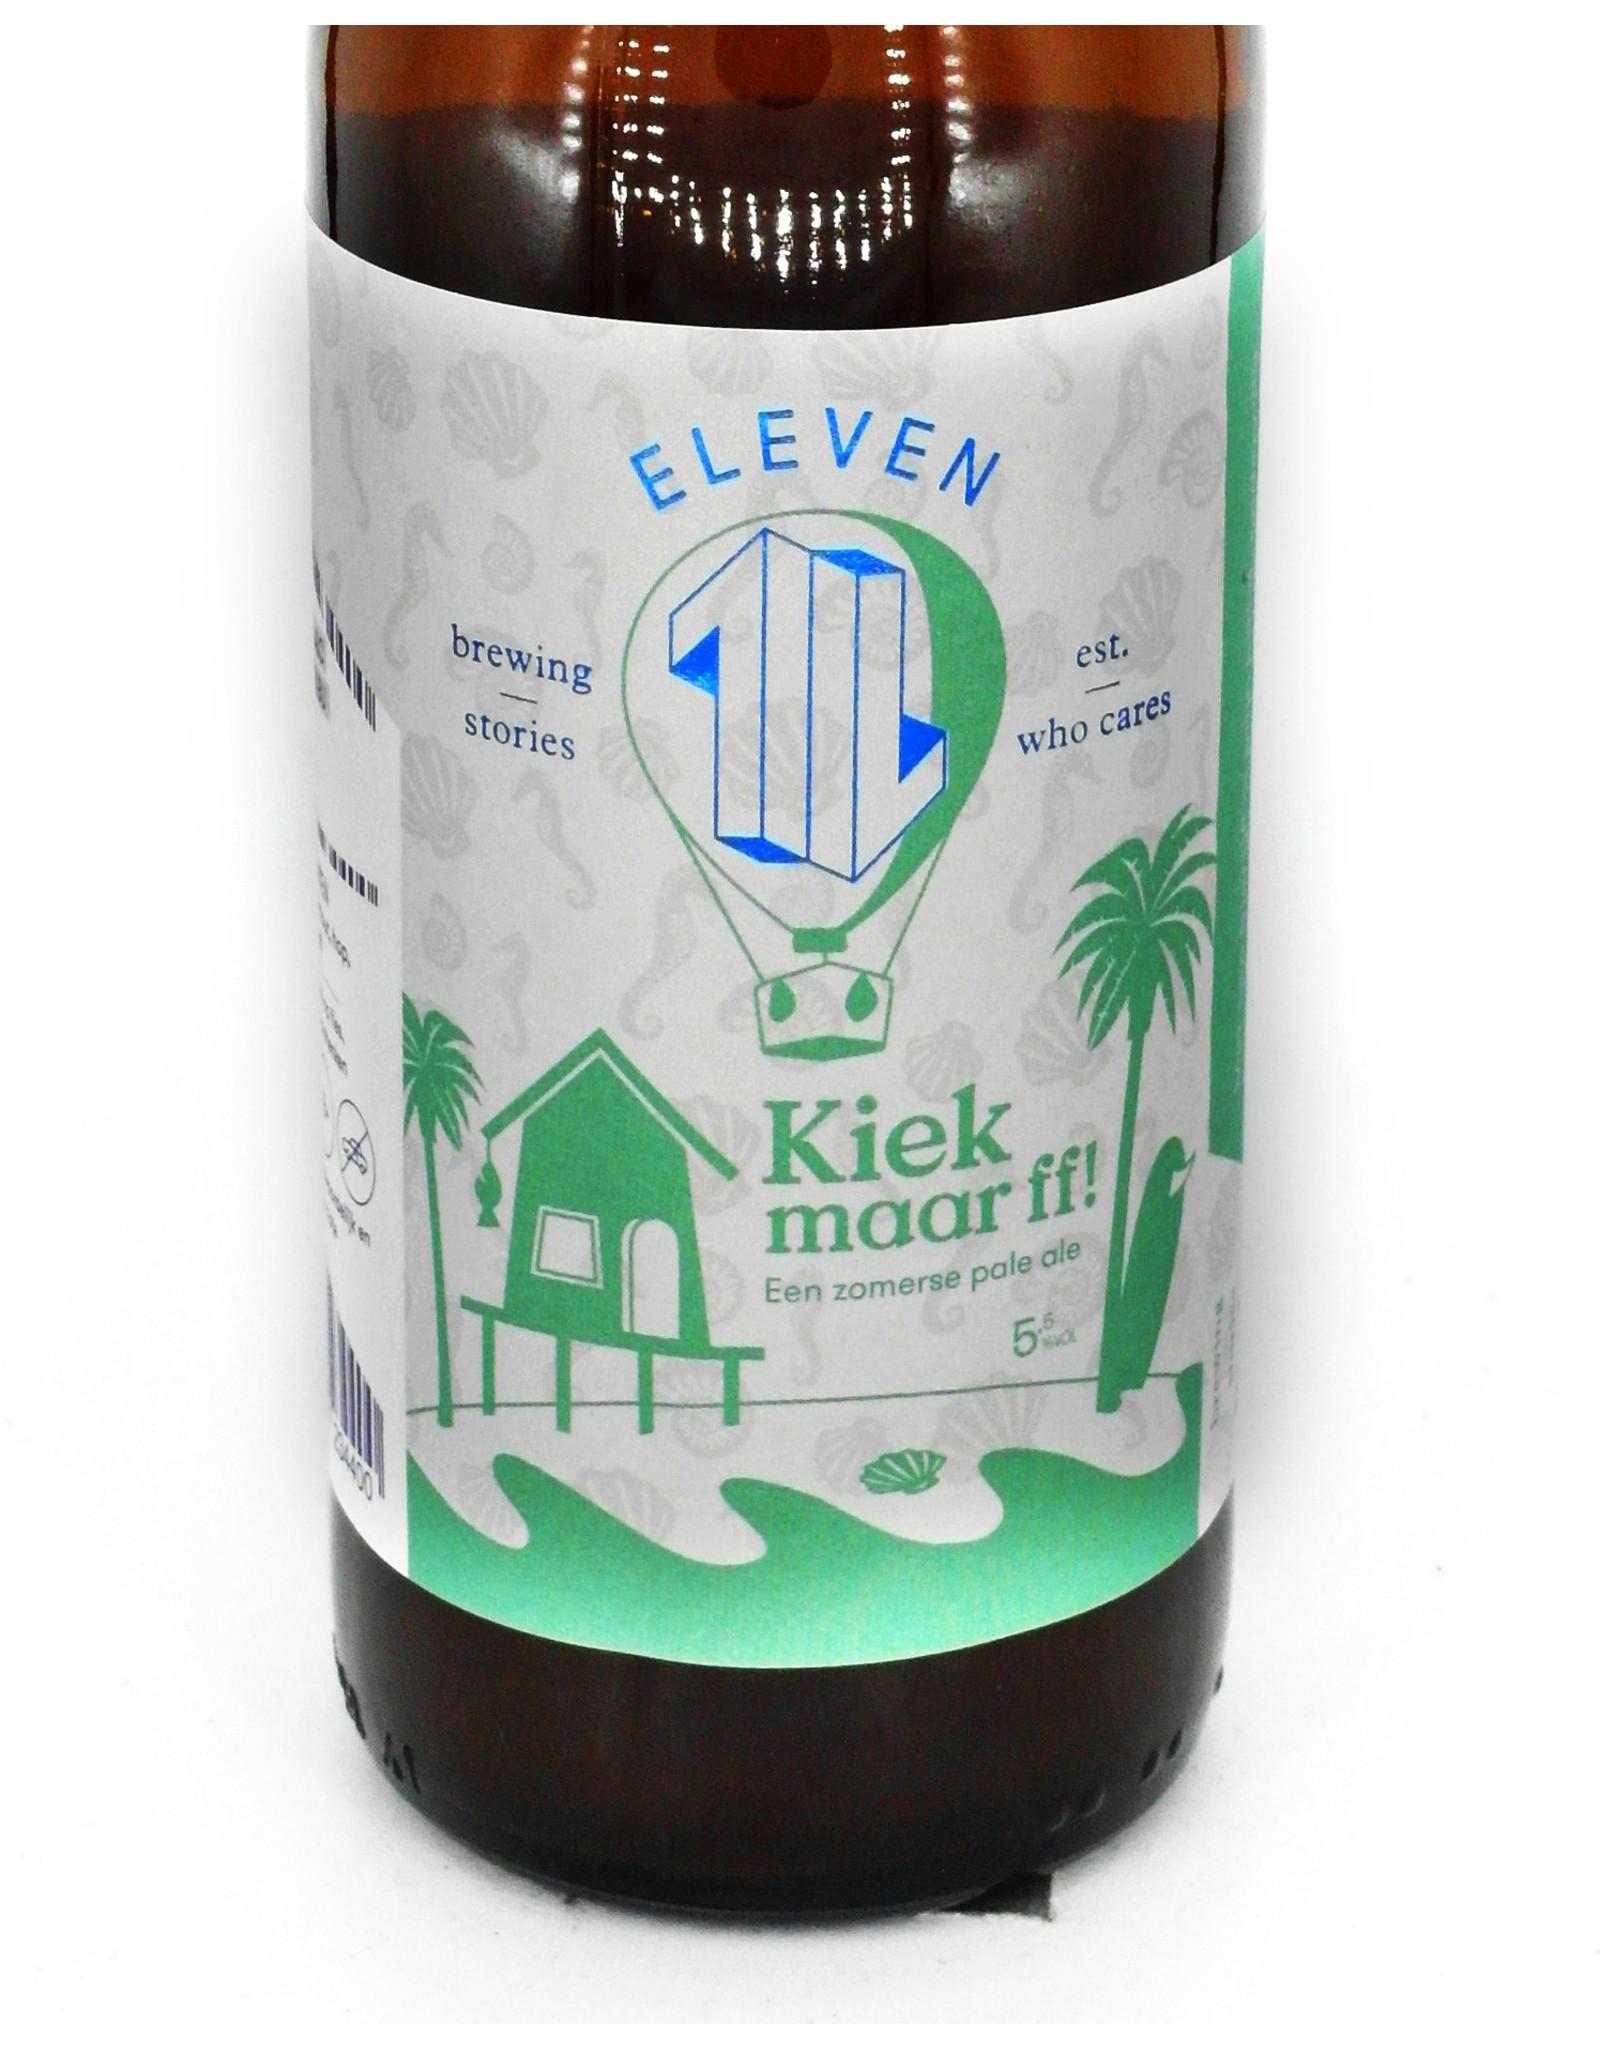 Eleven Brewery Eleven Brewery: Kiek maar ff